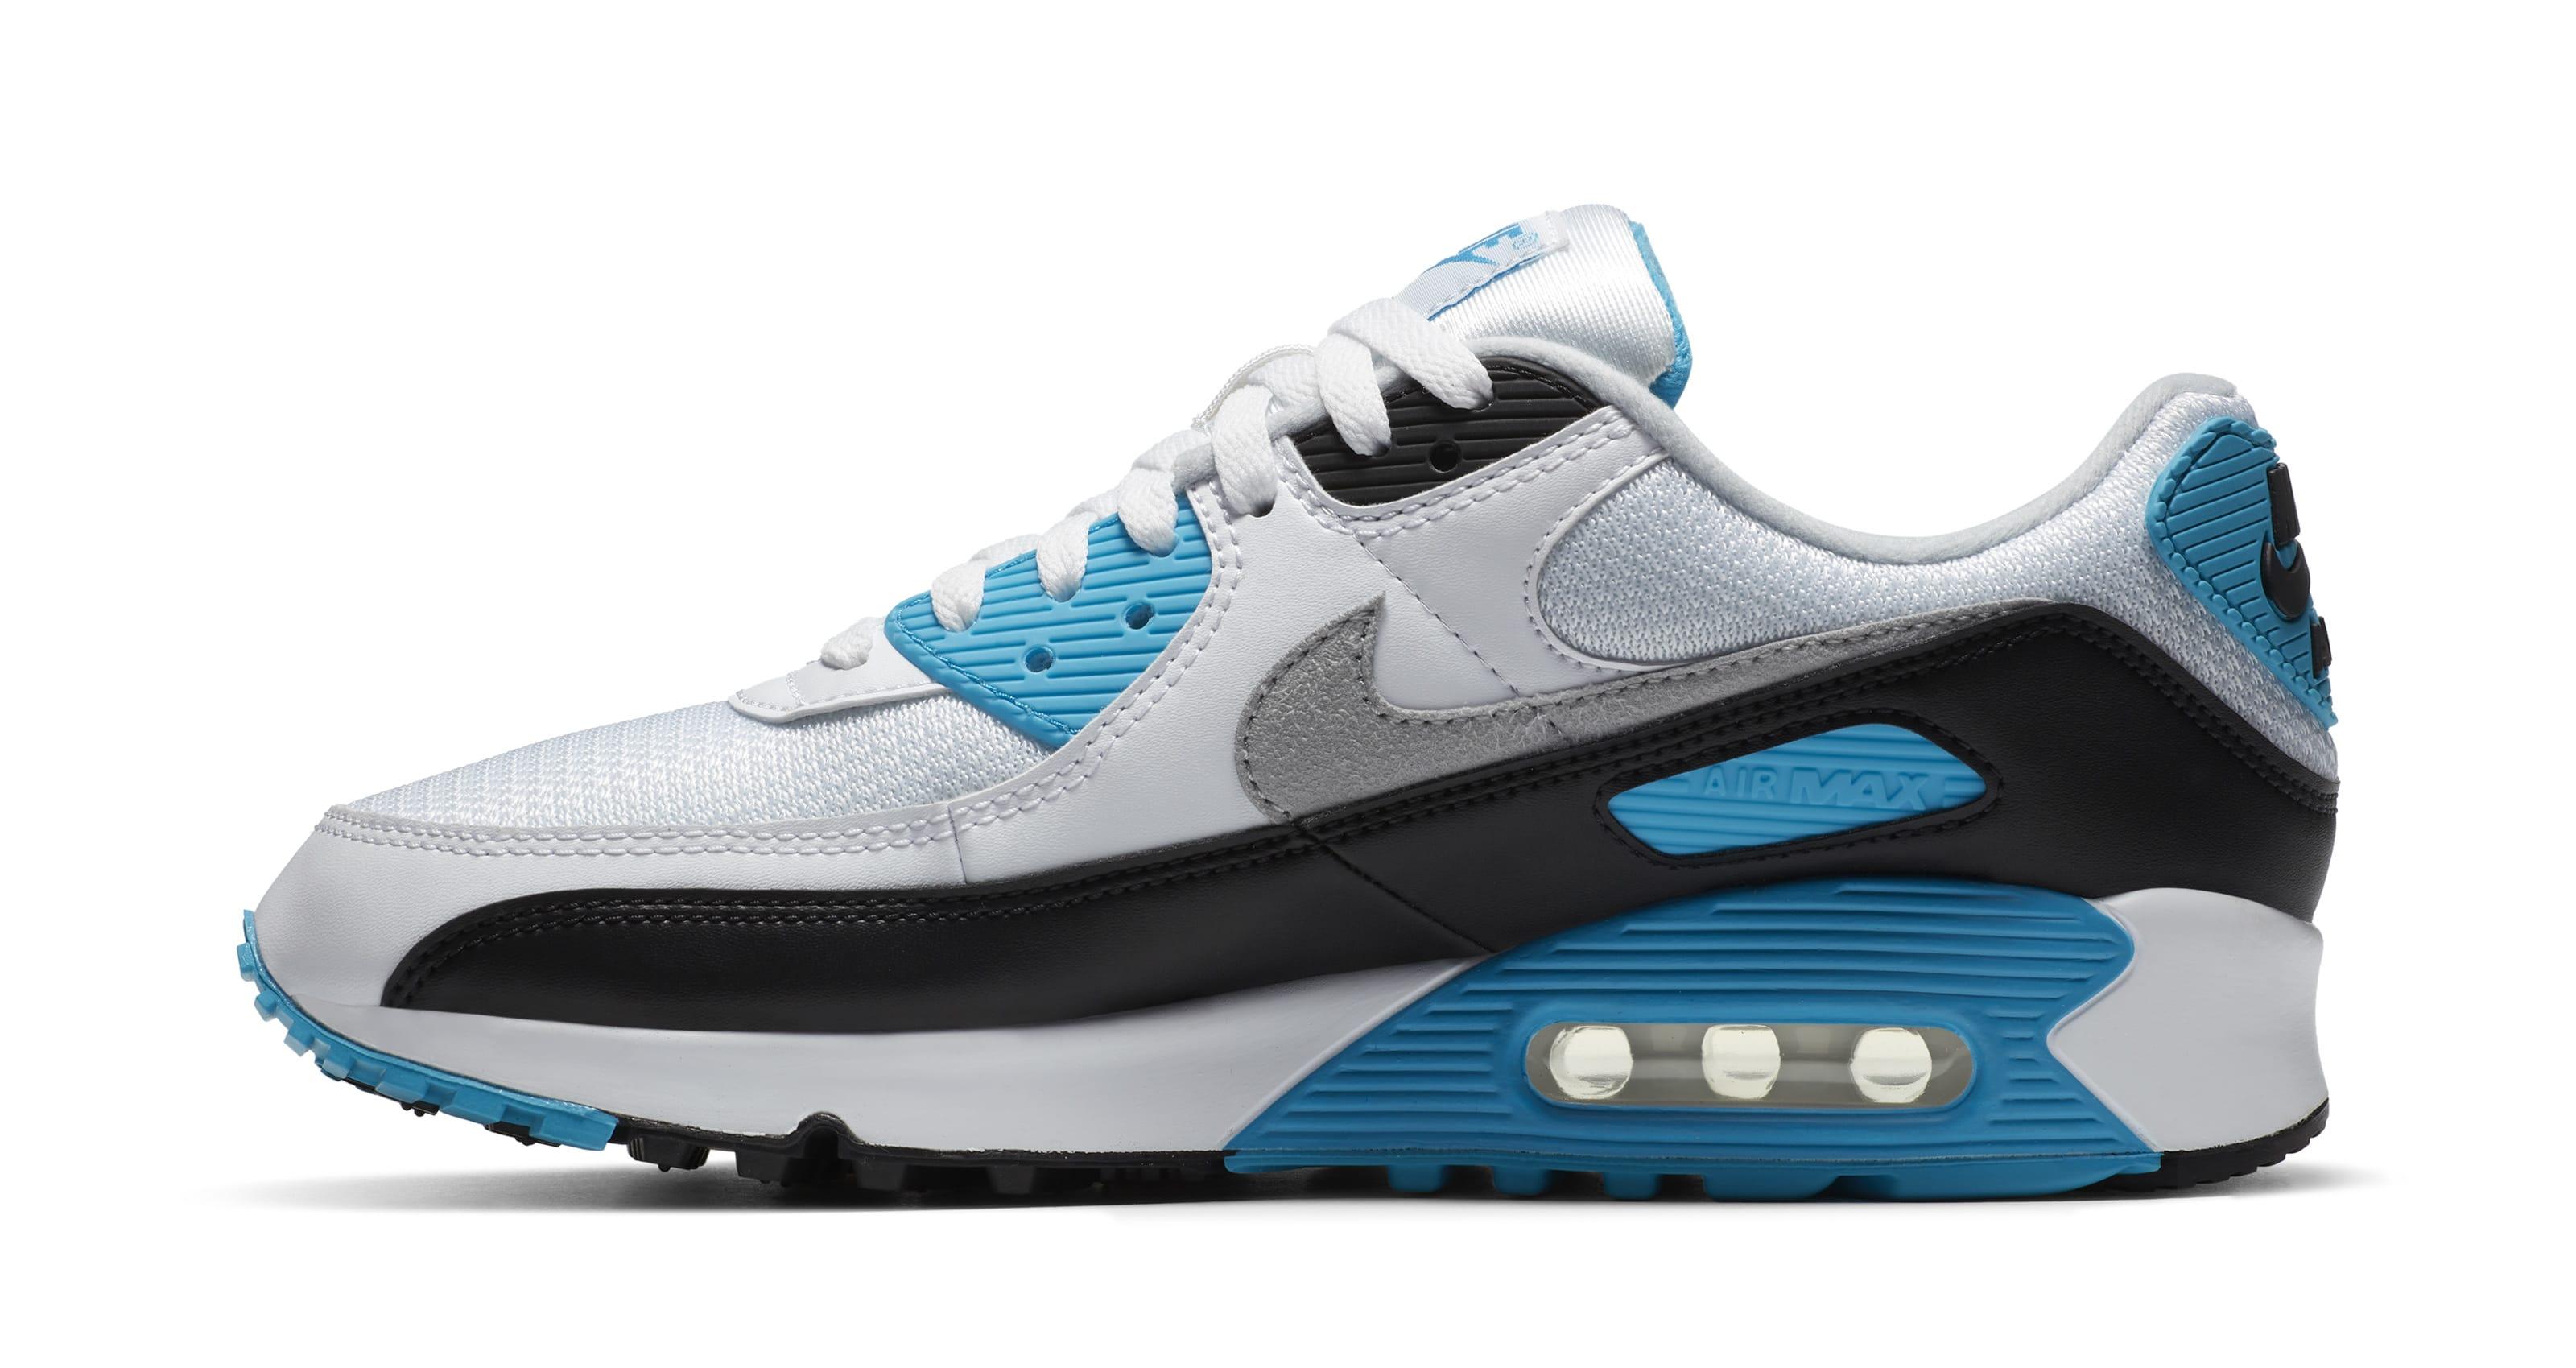 Nike Air Max 90 'Laser Blue' 2020 Lateral